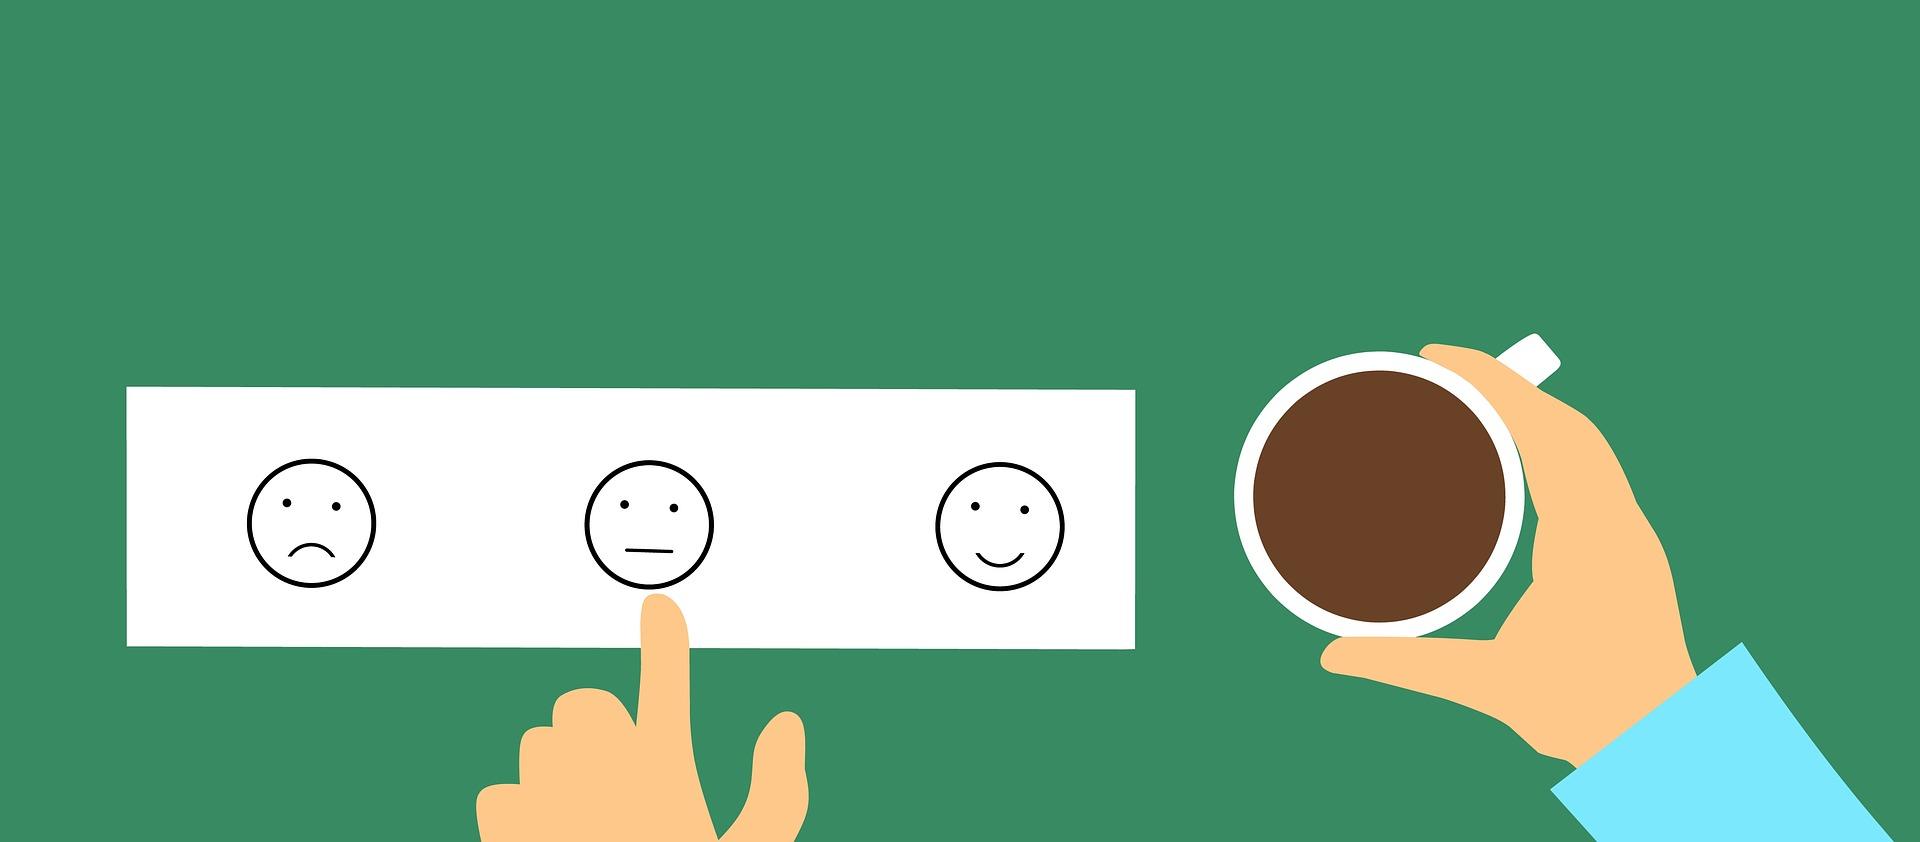 User feedback and coffee mug on desk